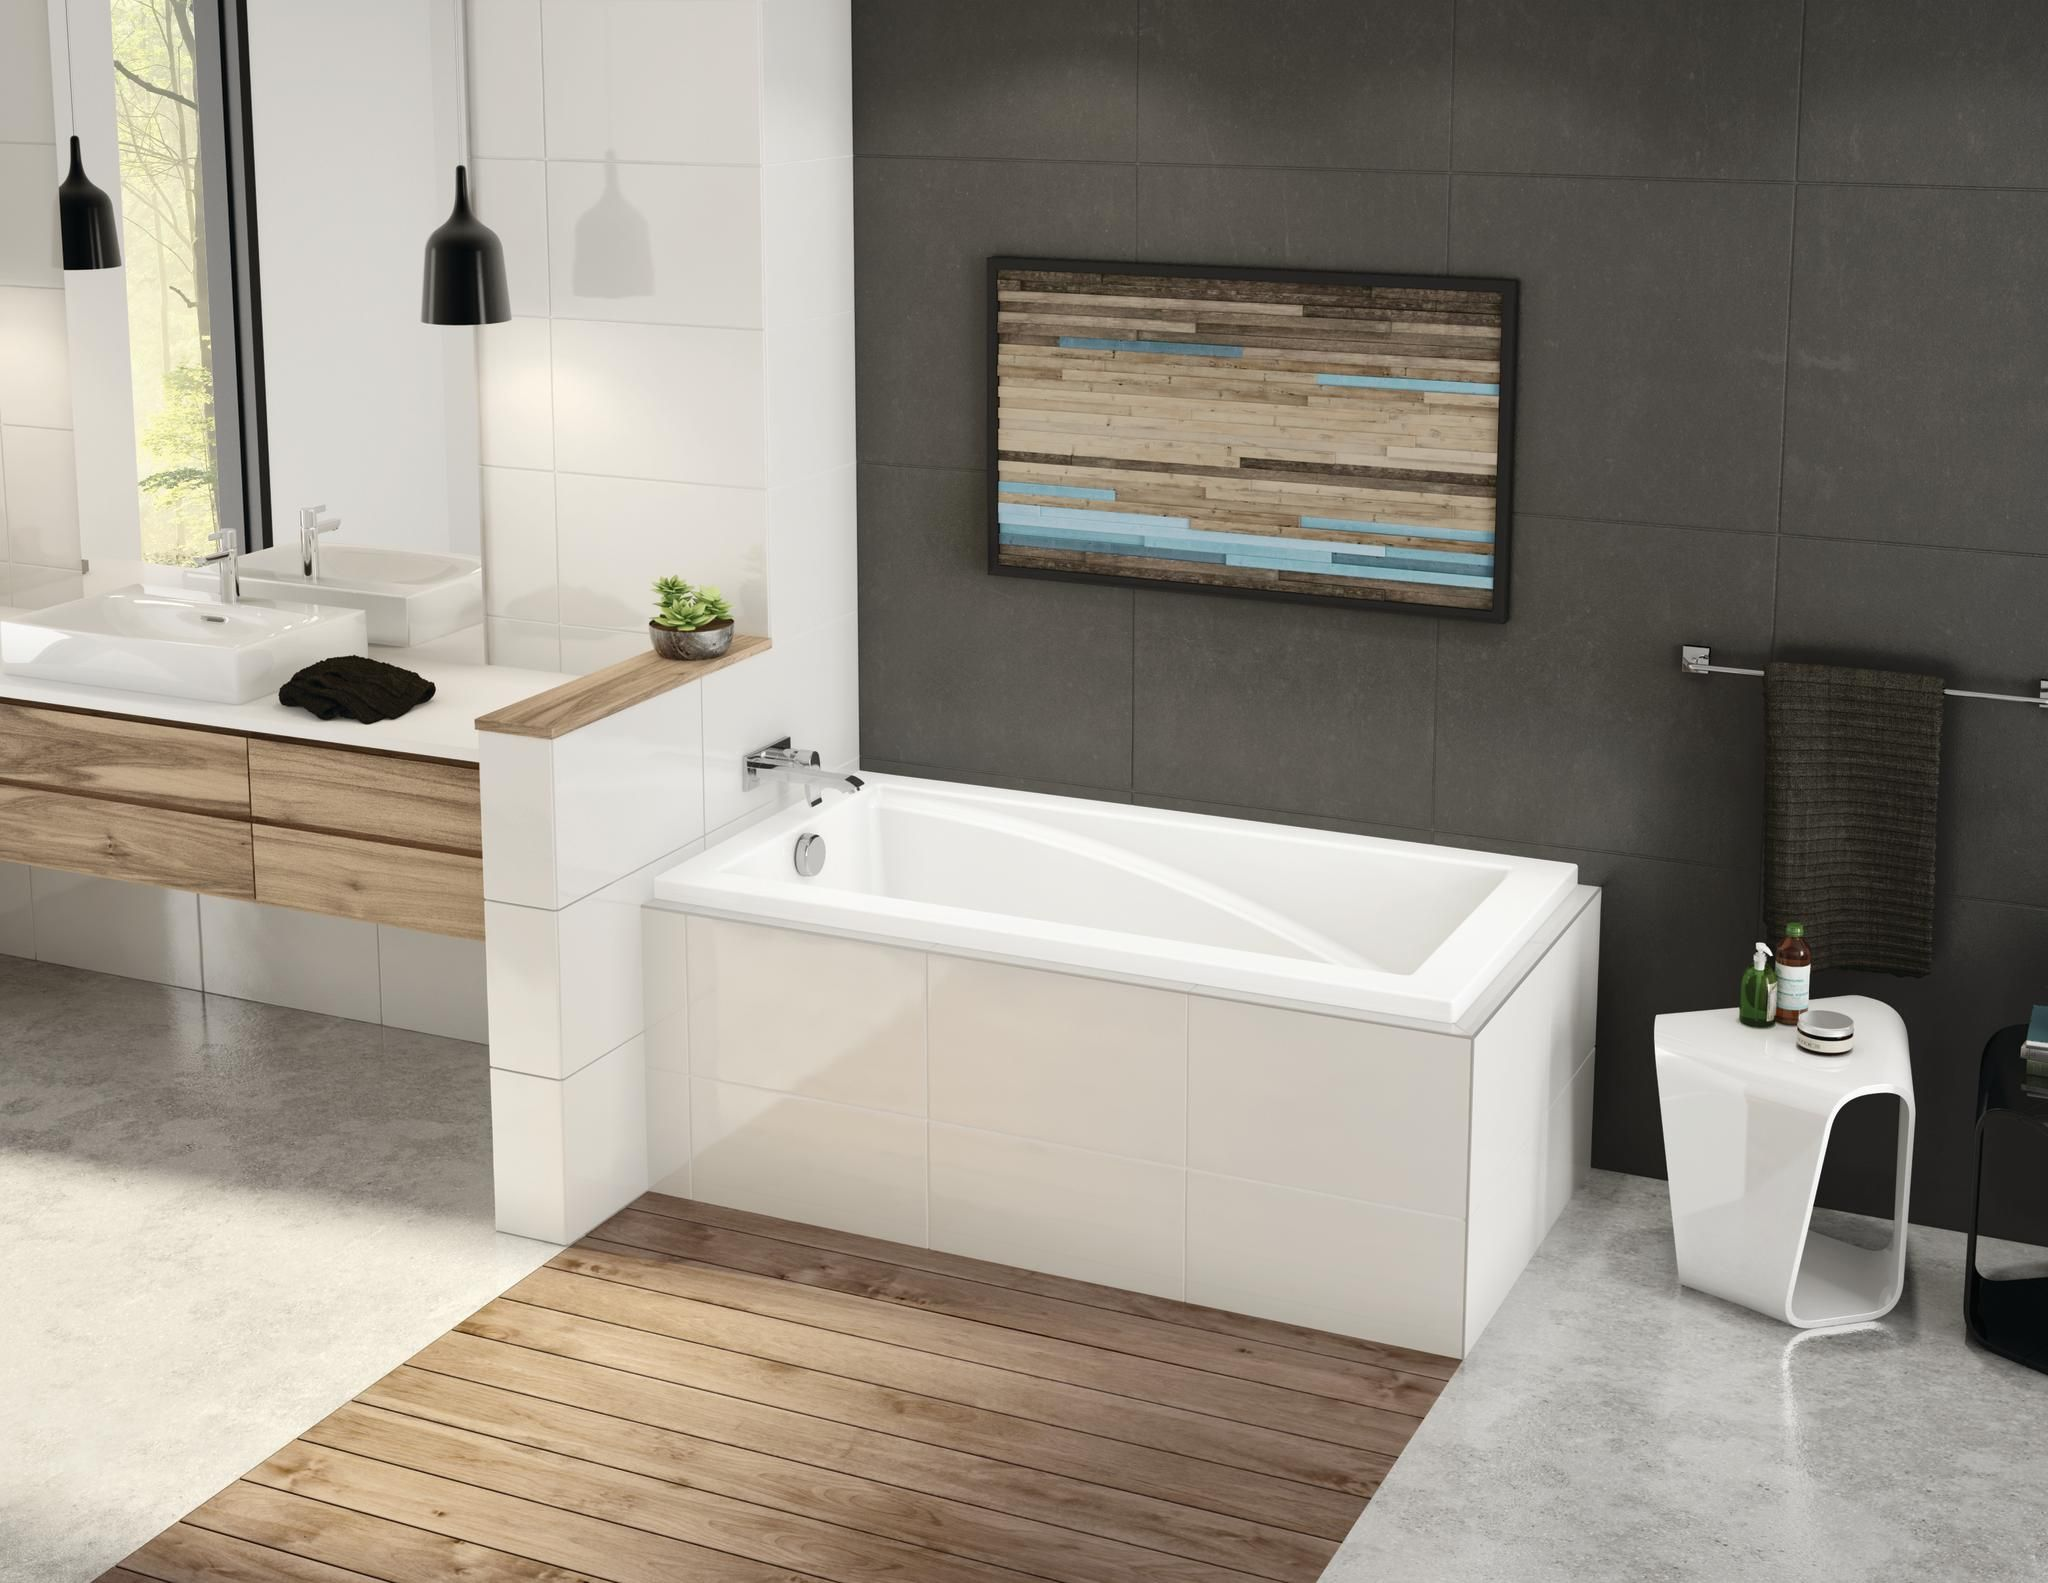 ModulR 6032 Corner Soaker Tub | Tubs and Corner